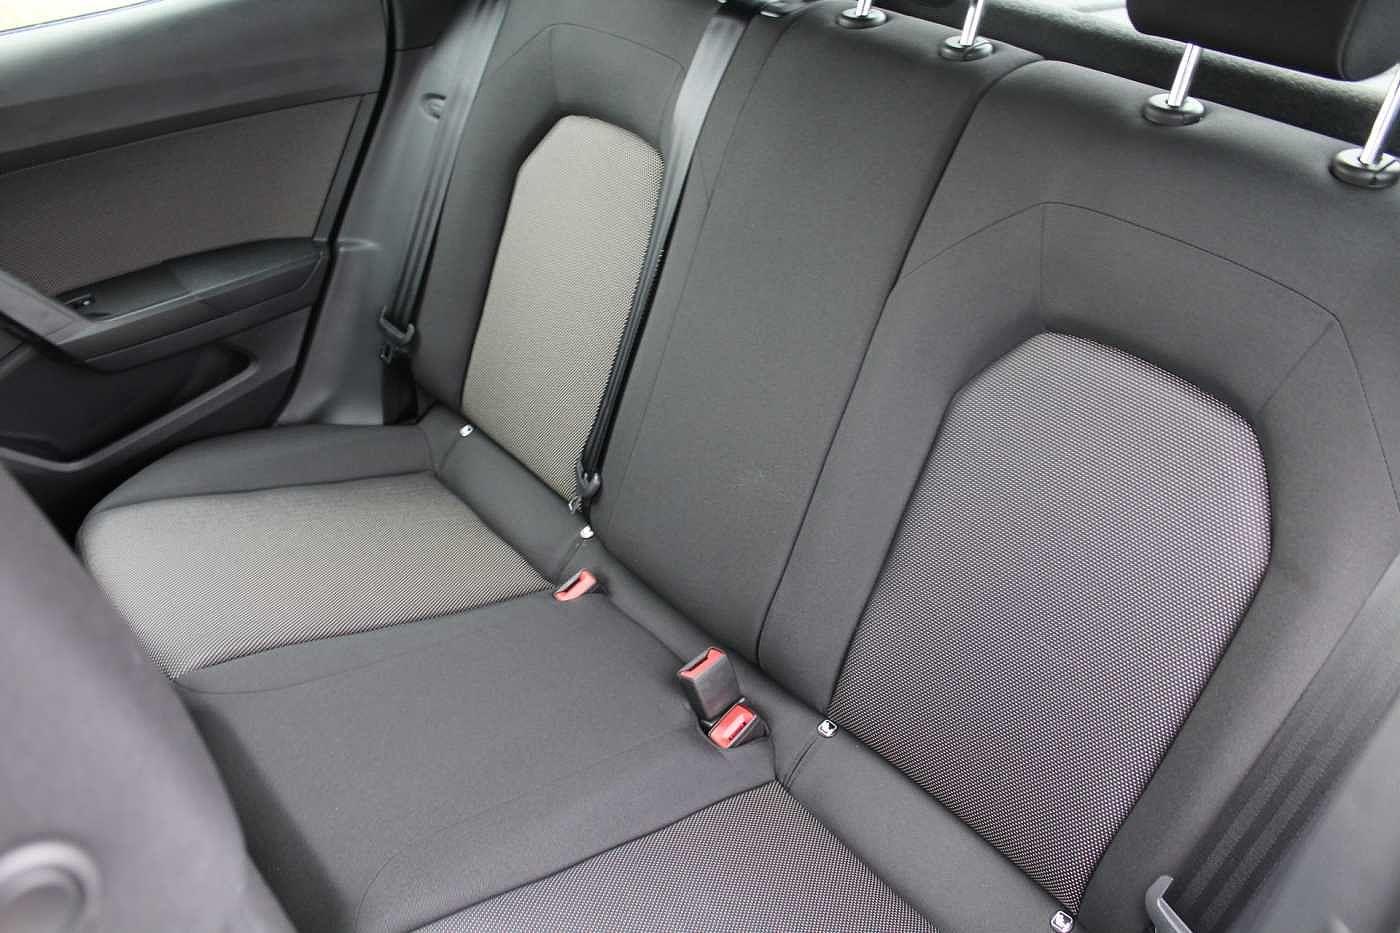 SEAT Arona Images